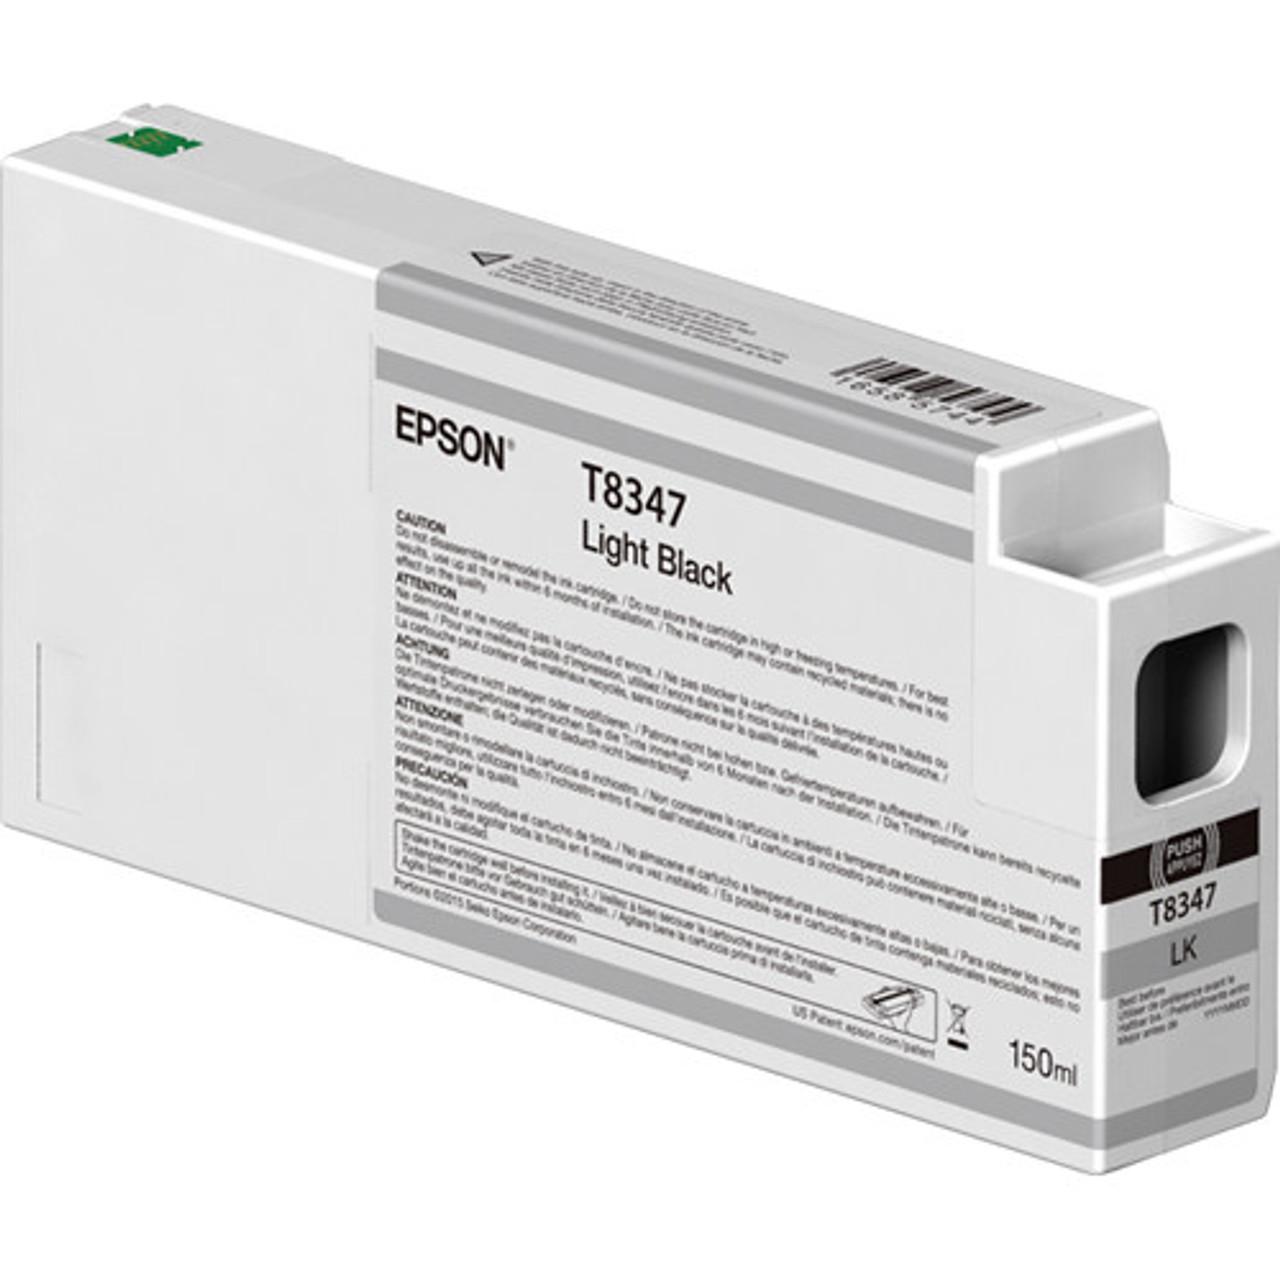 Epson T834700 Light Black Ink Cartridge, 150 mL